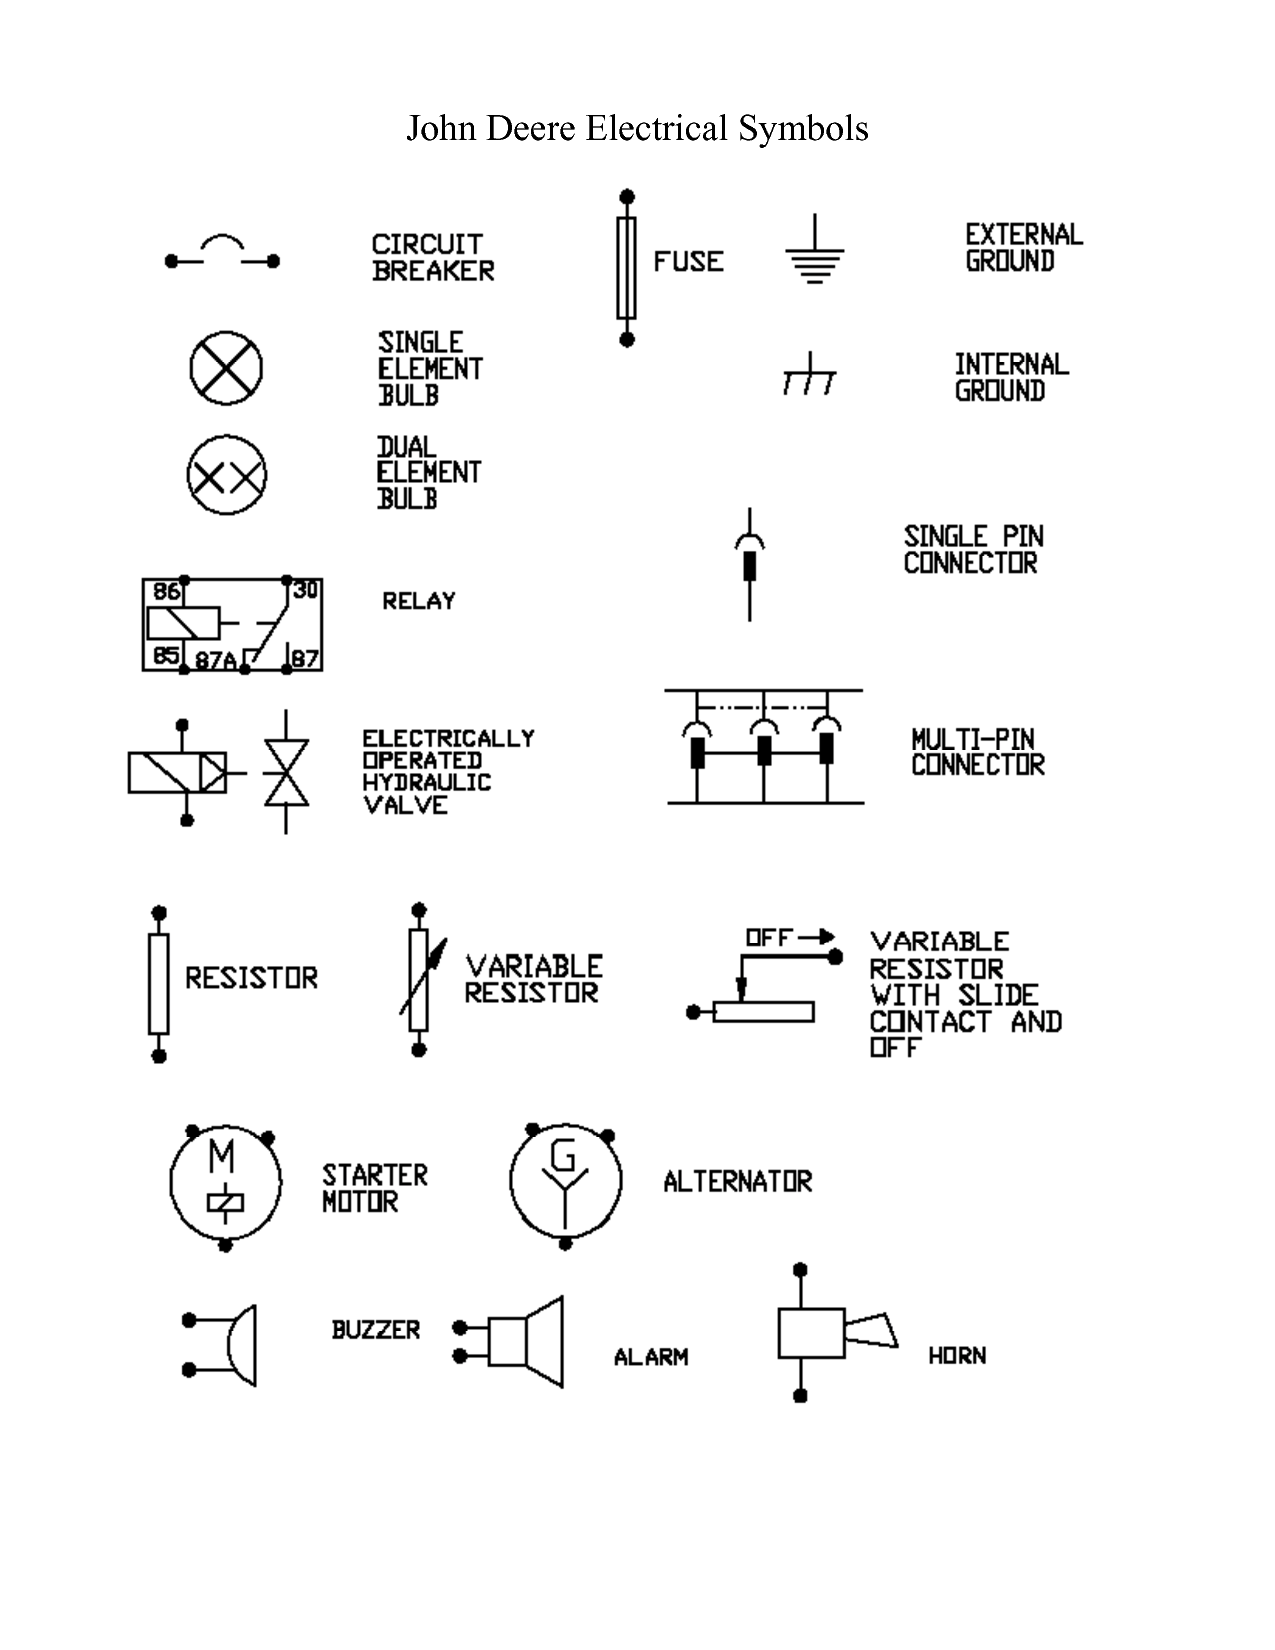 john deere wiring diagram symbols tao 110cc atv pnuematics electrical